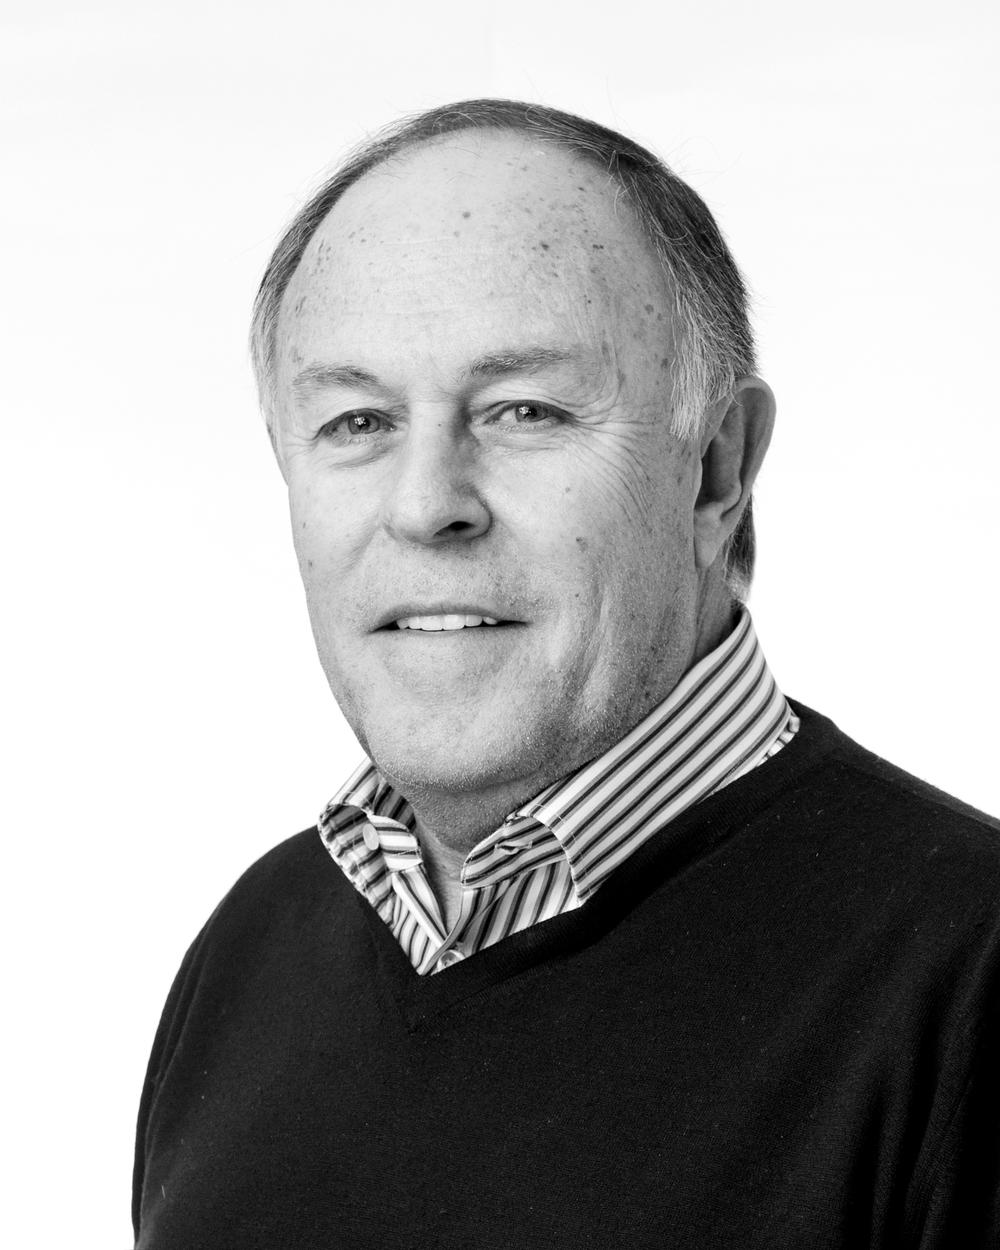 Larry-Global Capital Headshots-102 (PS).jpg